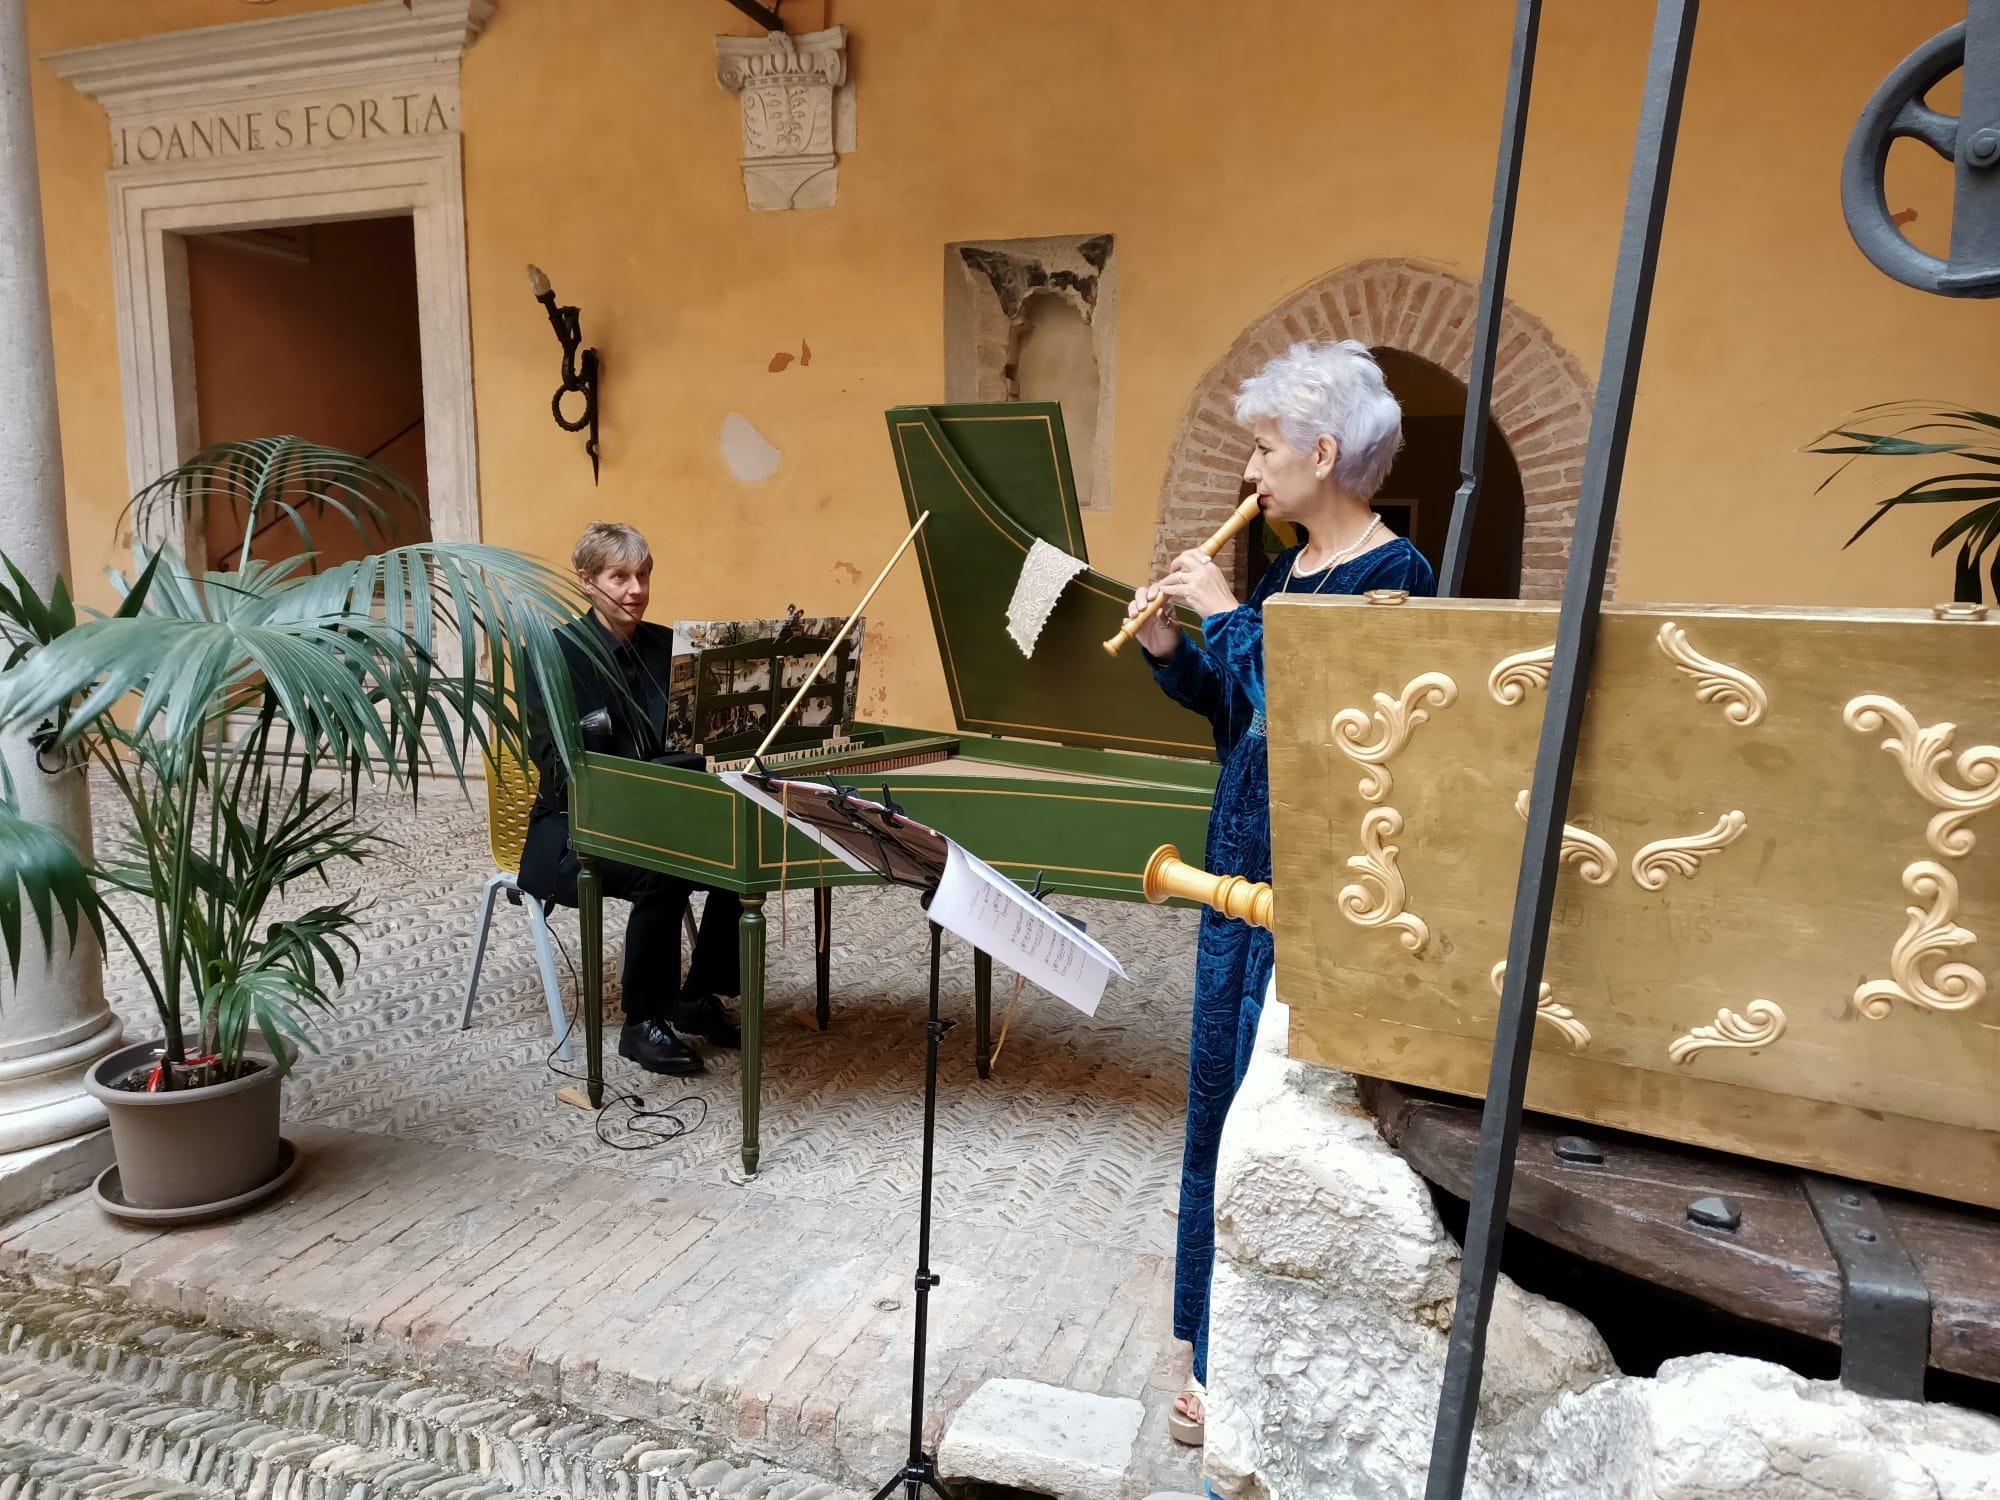 Musicae Amoeni Loci Gradara